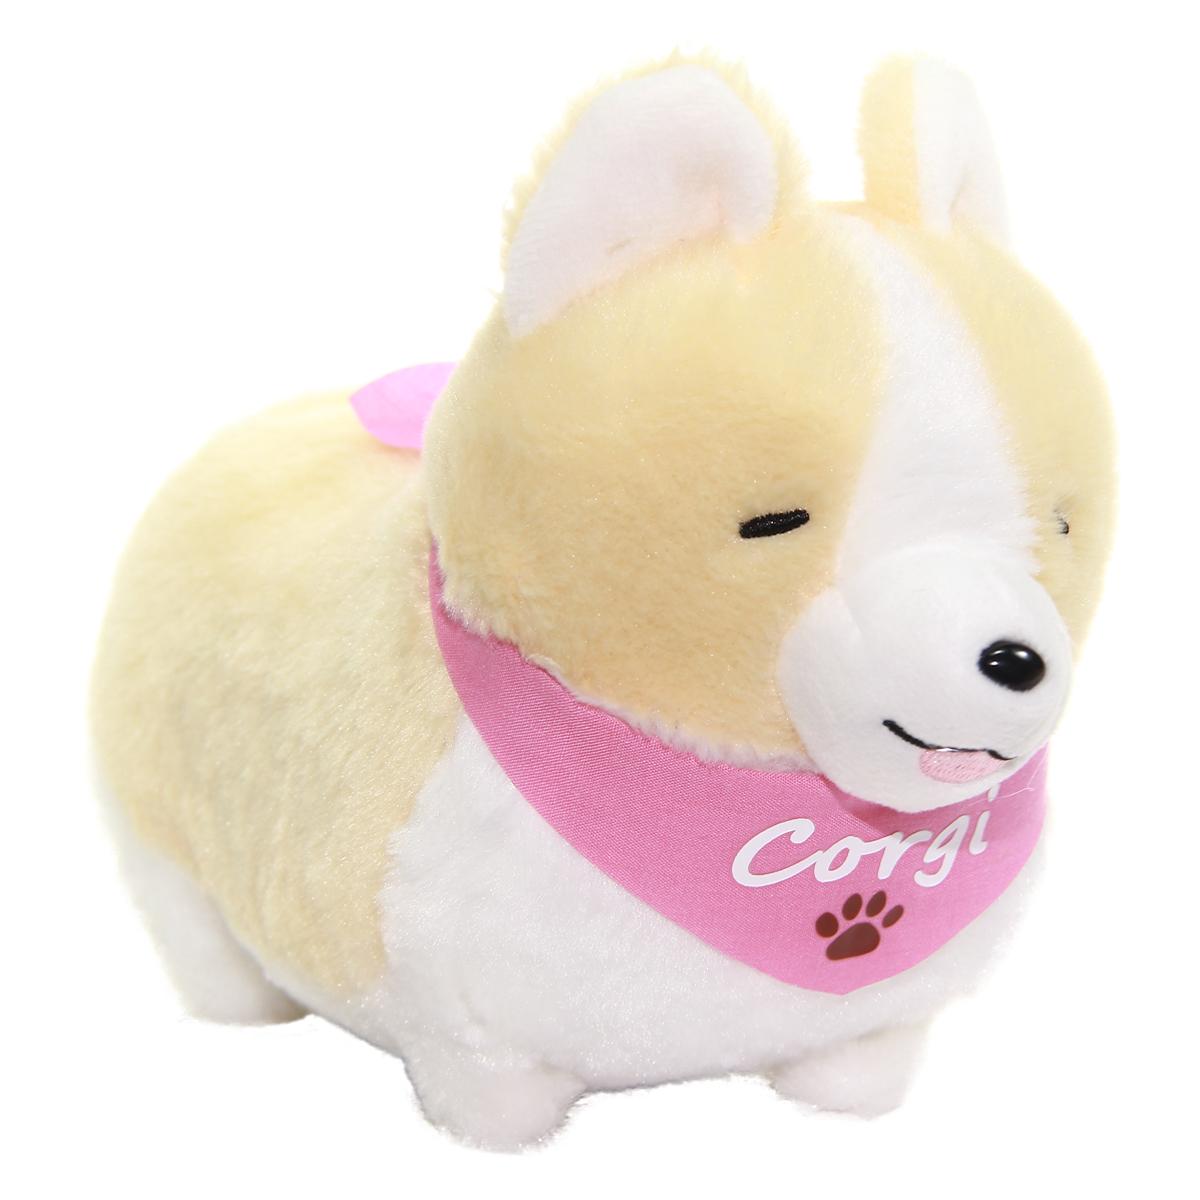 Amuse Ichi Ni no Corgi With Scarf Plush Collection Small Dog Plush Mugi-chan Beige Standard Size 6 Inches